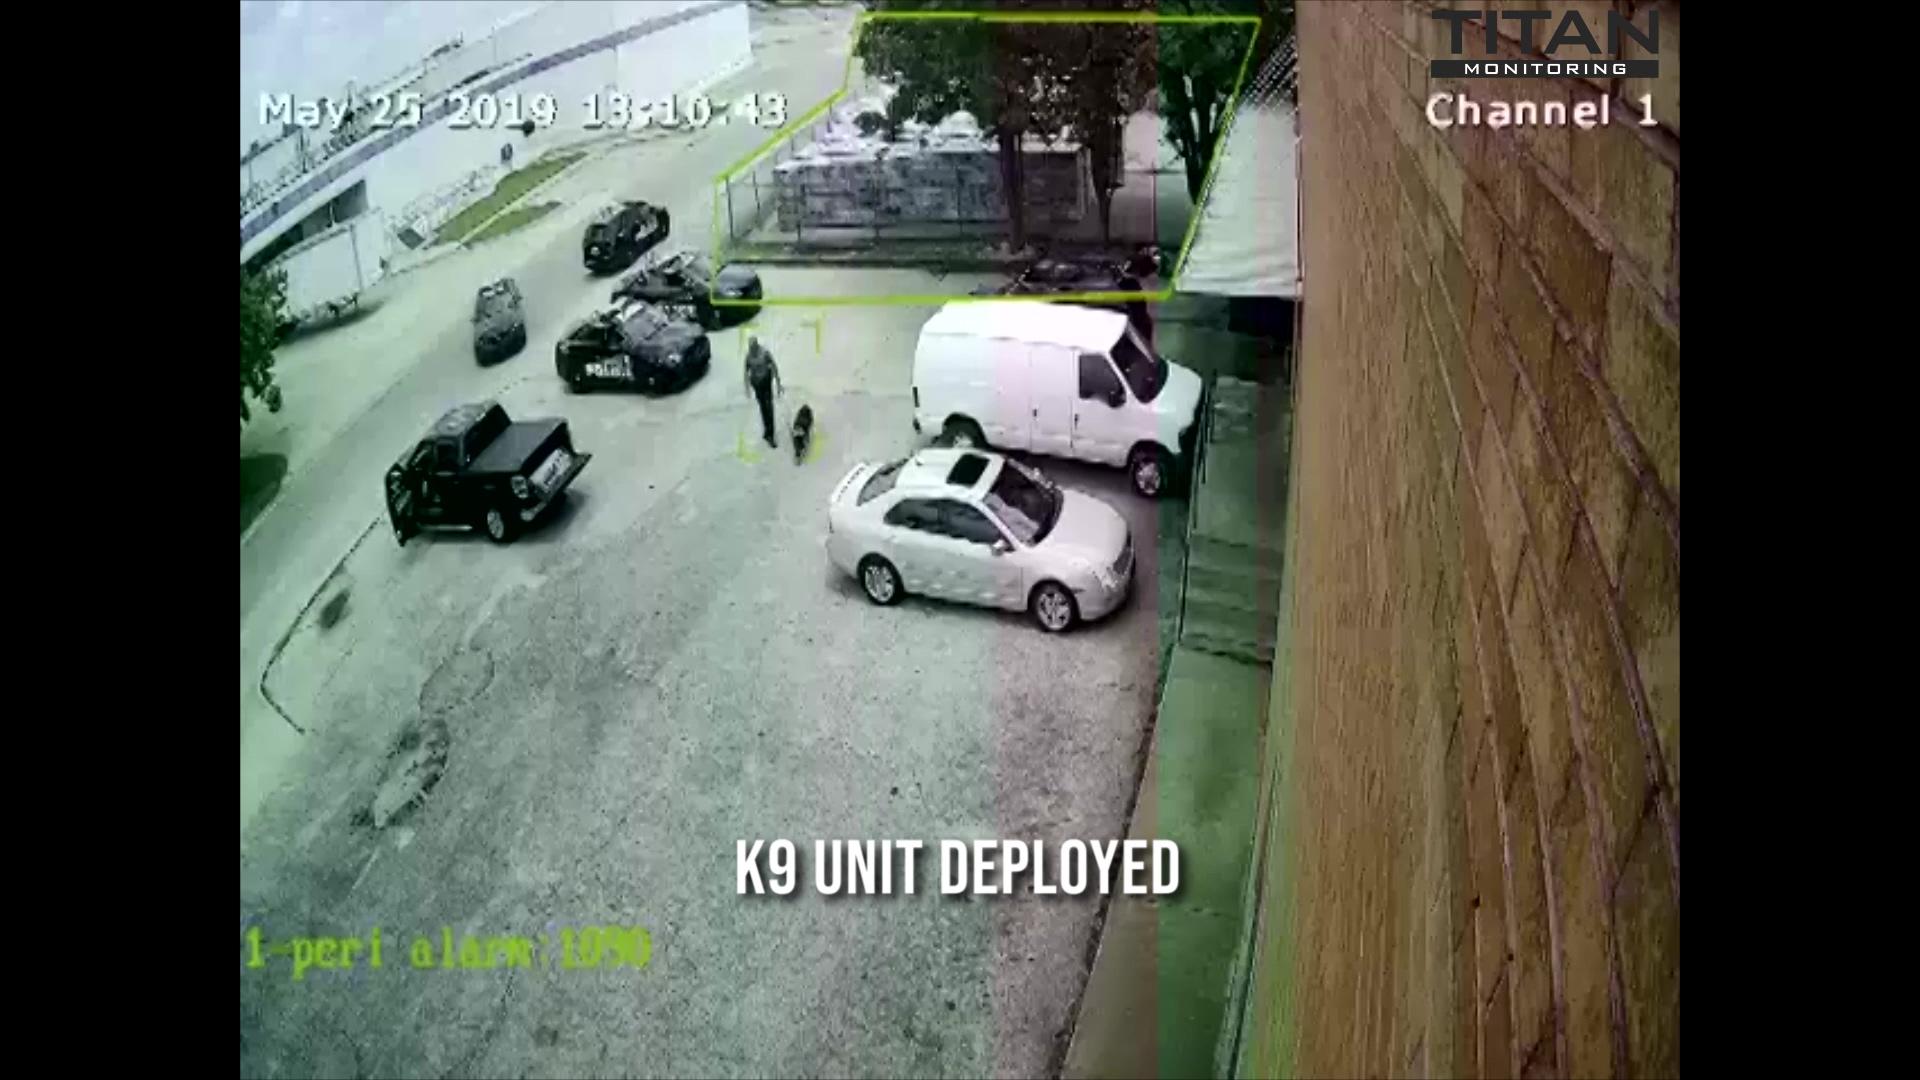 Spec OK Arrest Video 2019-2